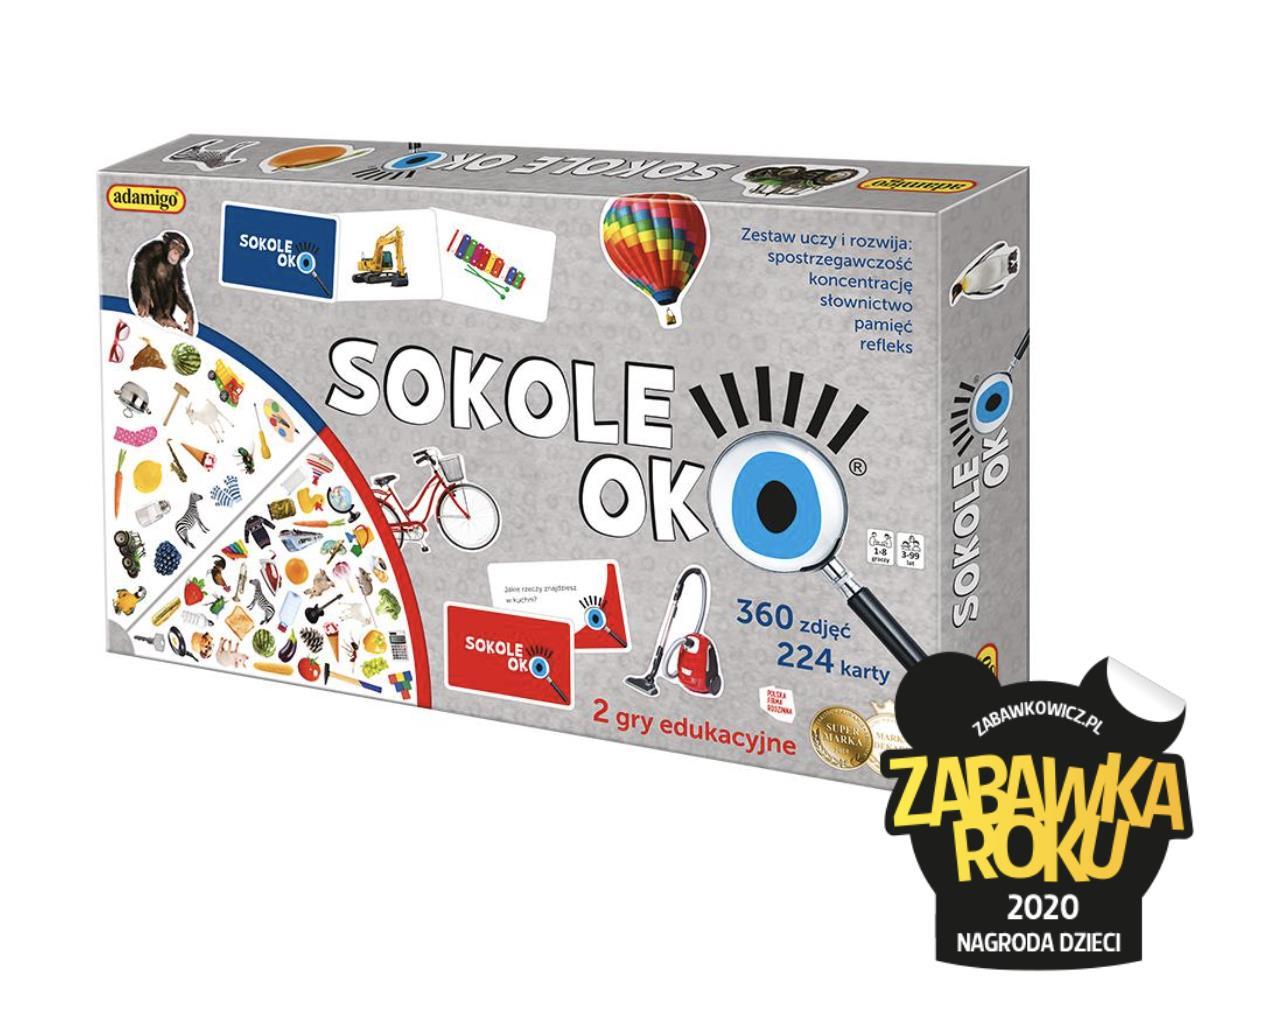 Sokole Oko - foto